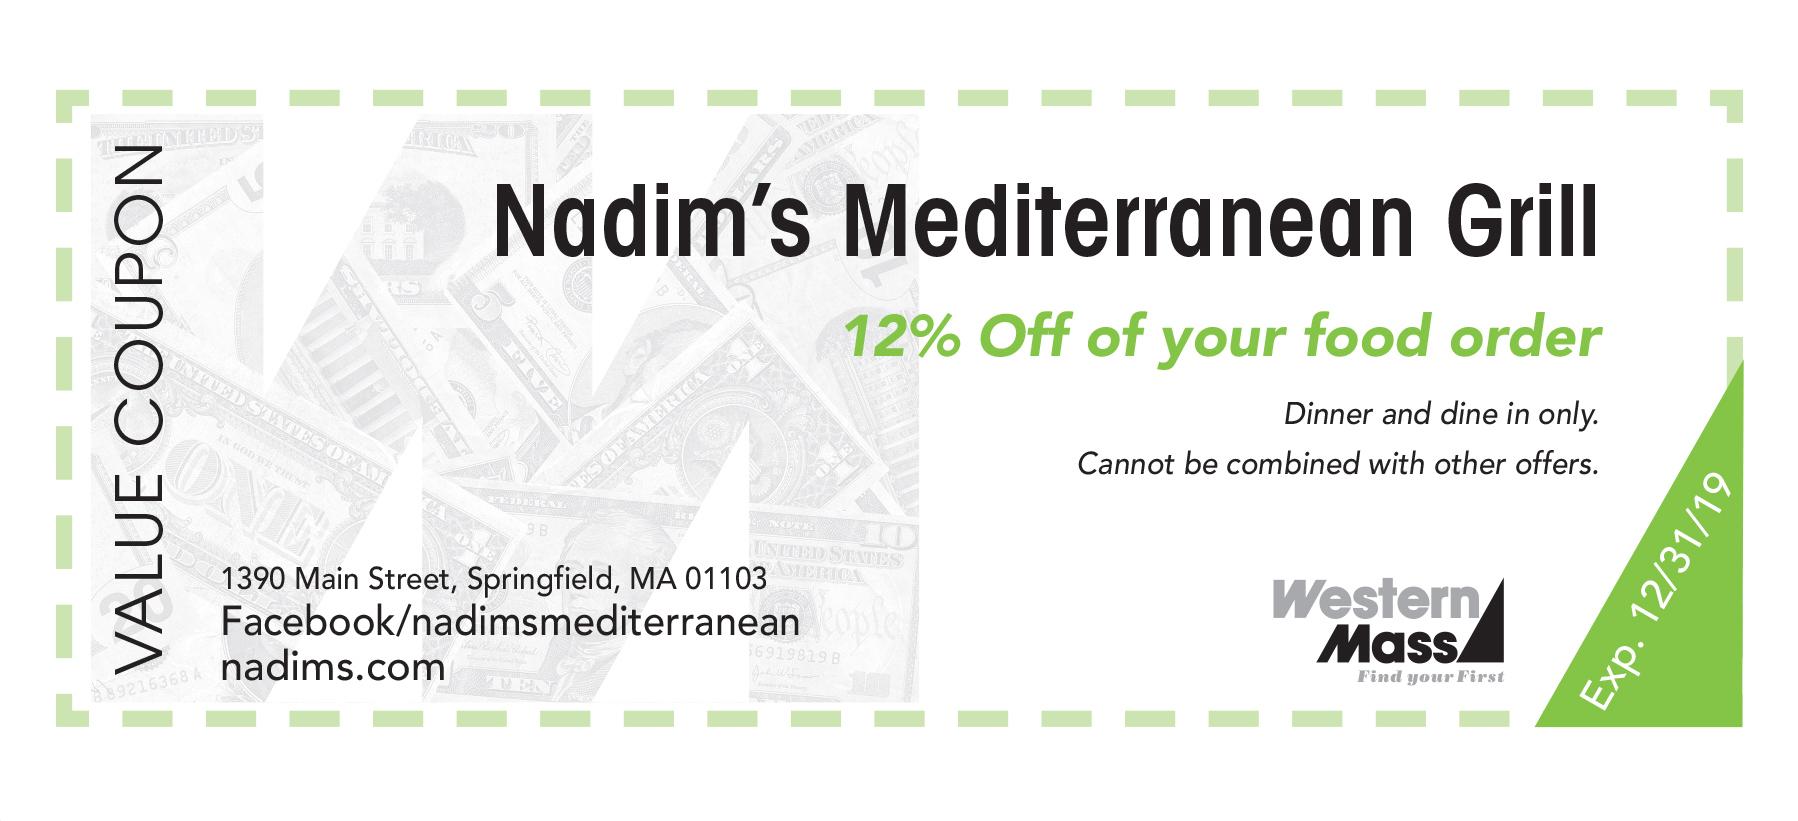 Nadim's Mediterranean Grill